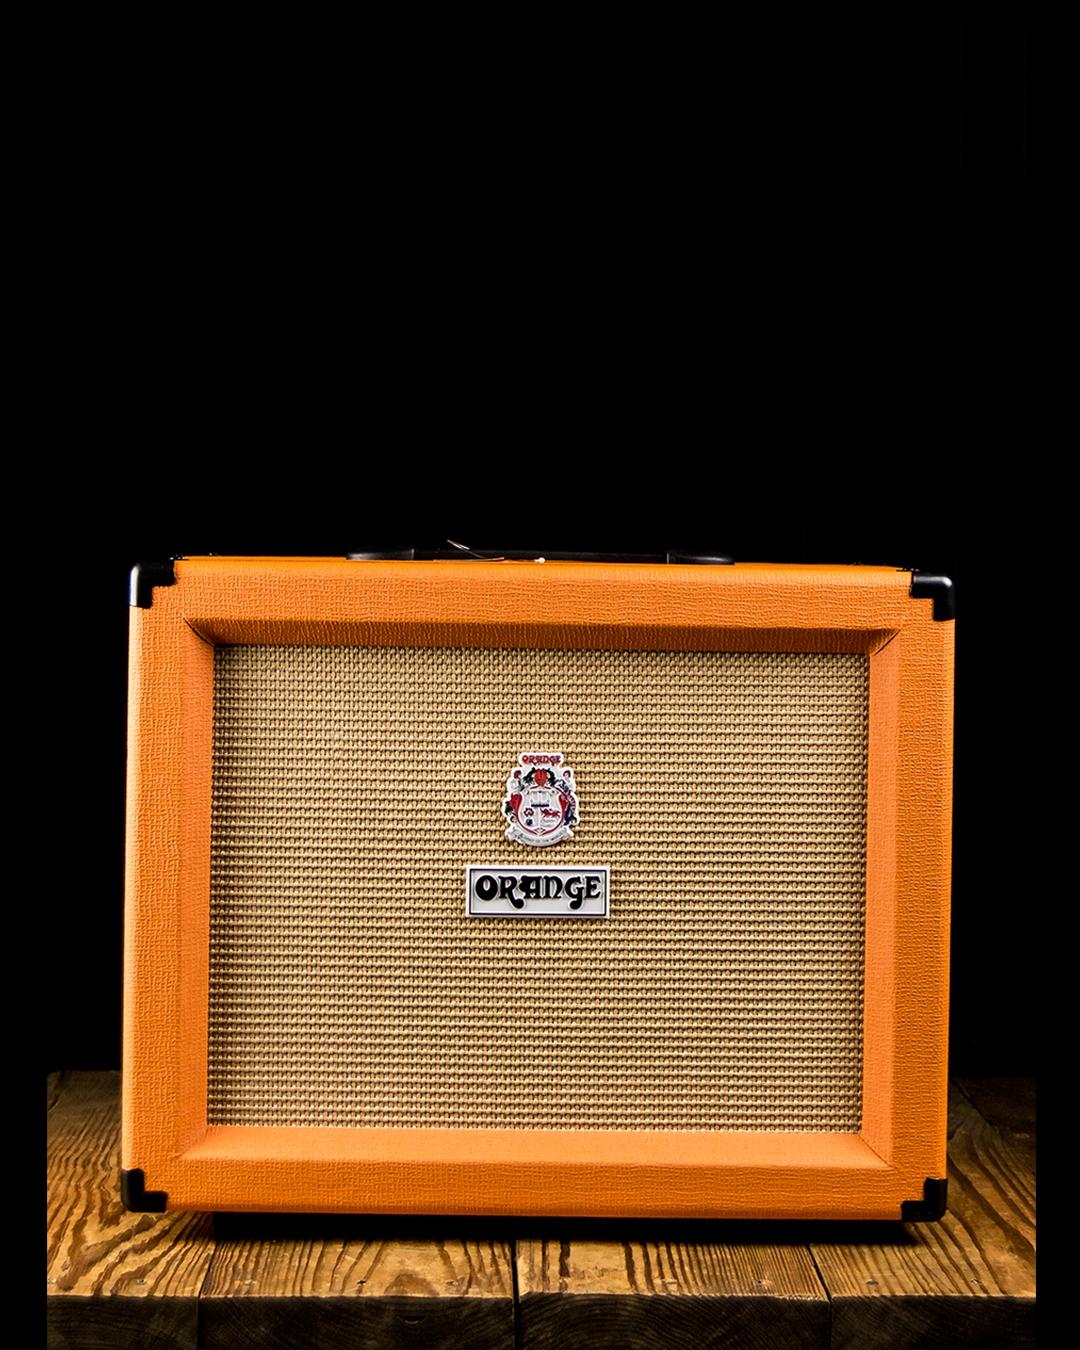 Orange Ppc112 60 Watt 1x12 Guitar Cabinet Orange